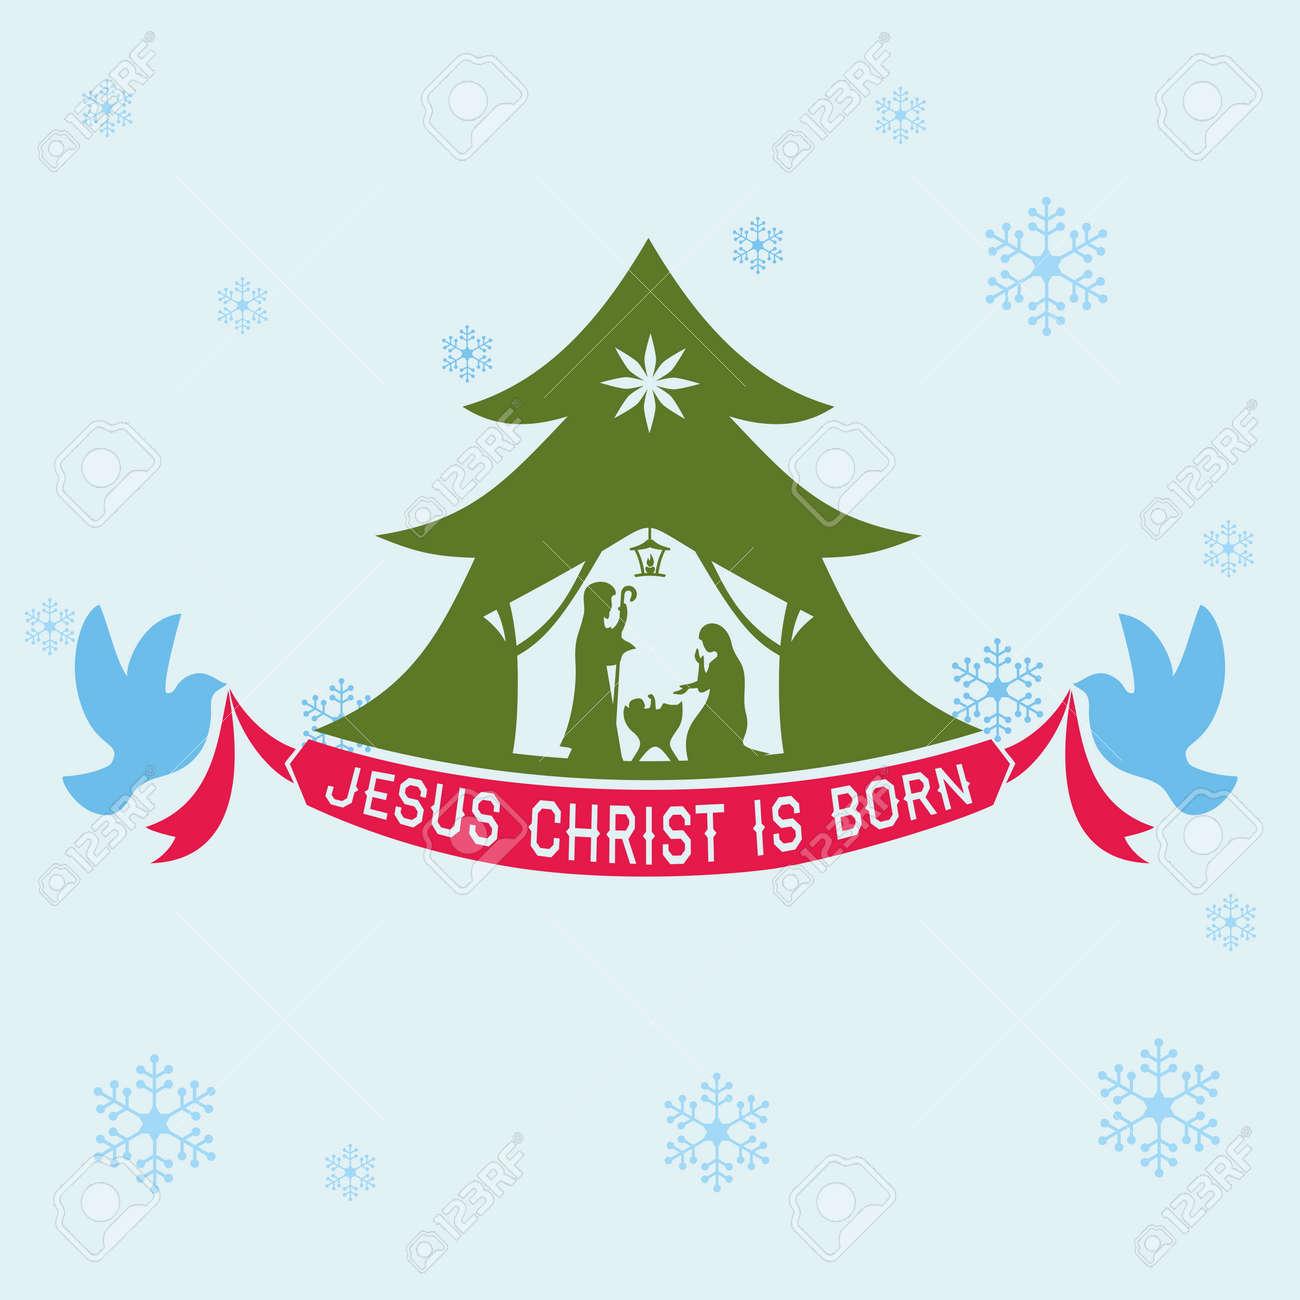 Merry Christmas Jesus.Merry Christmas Jesus Christ Is Born